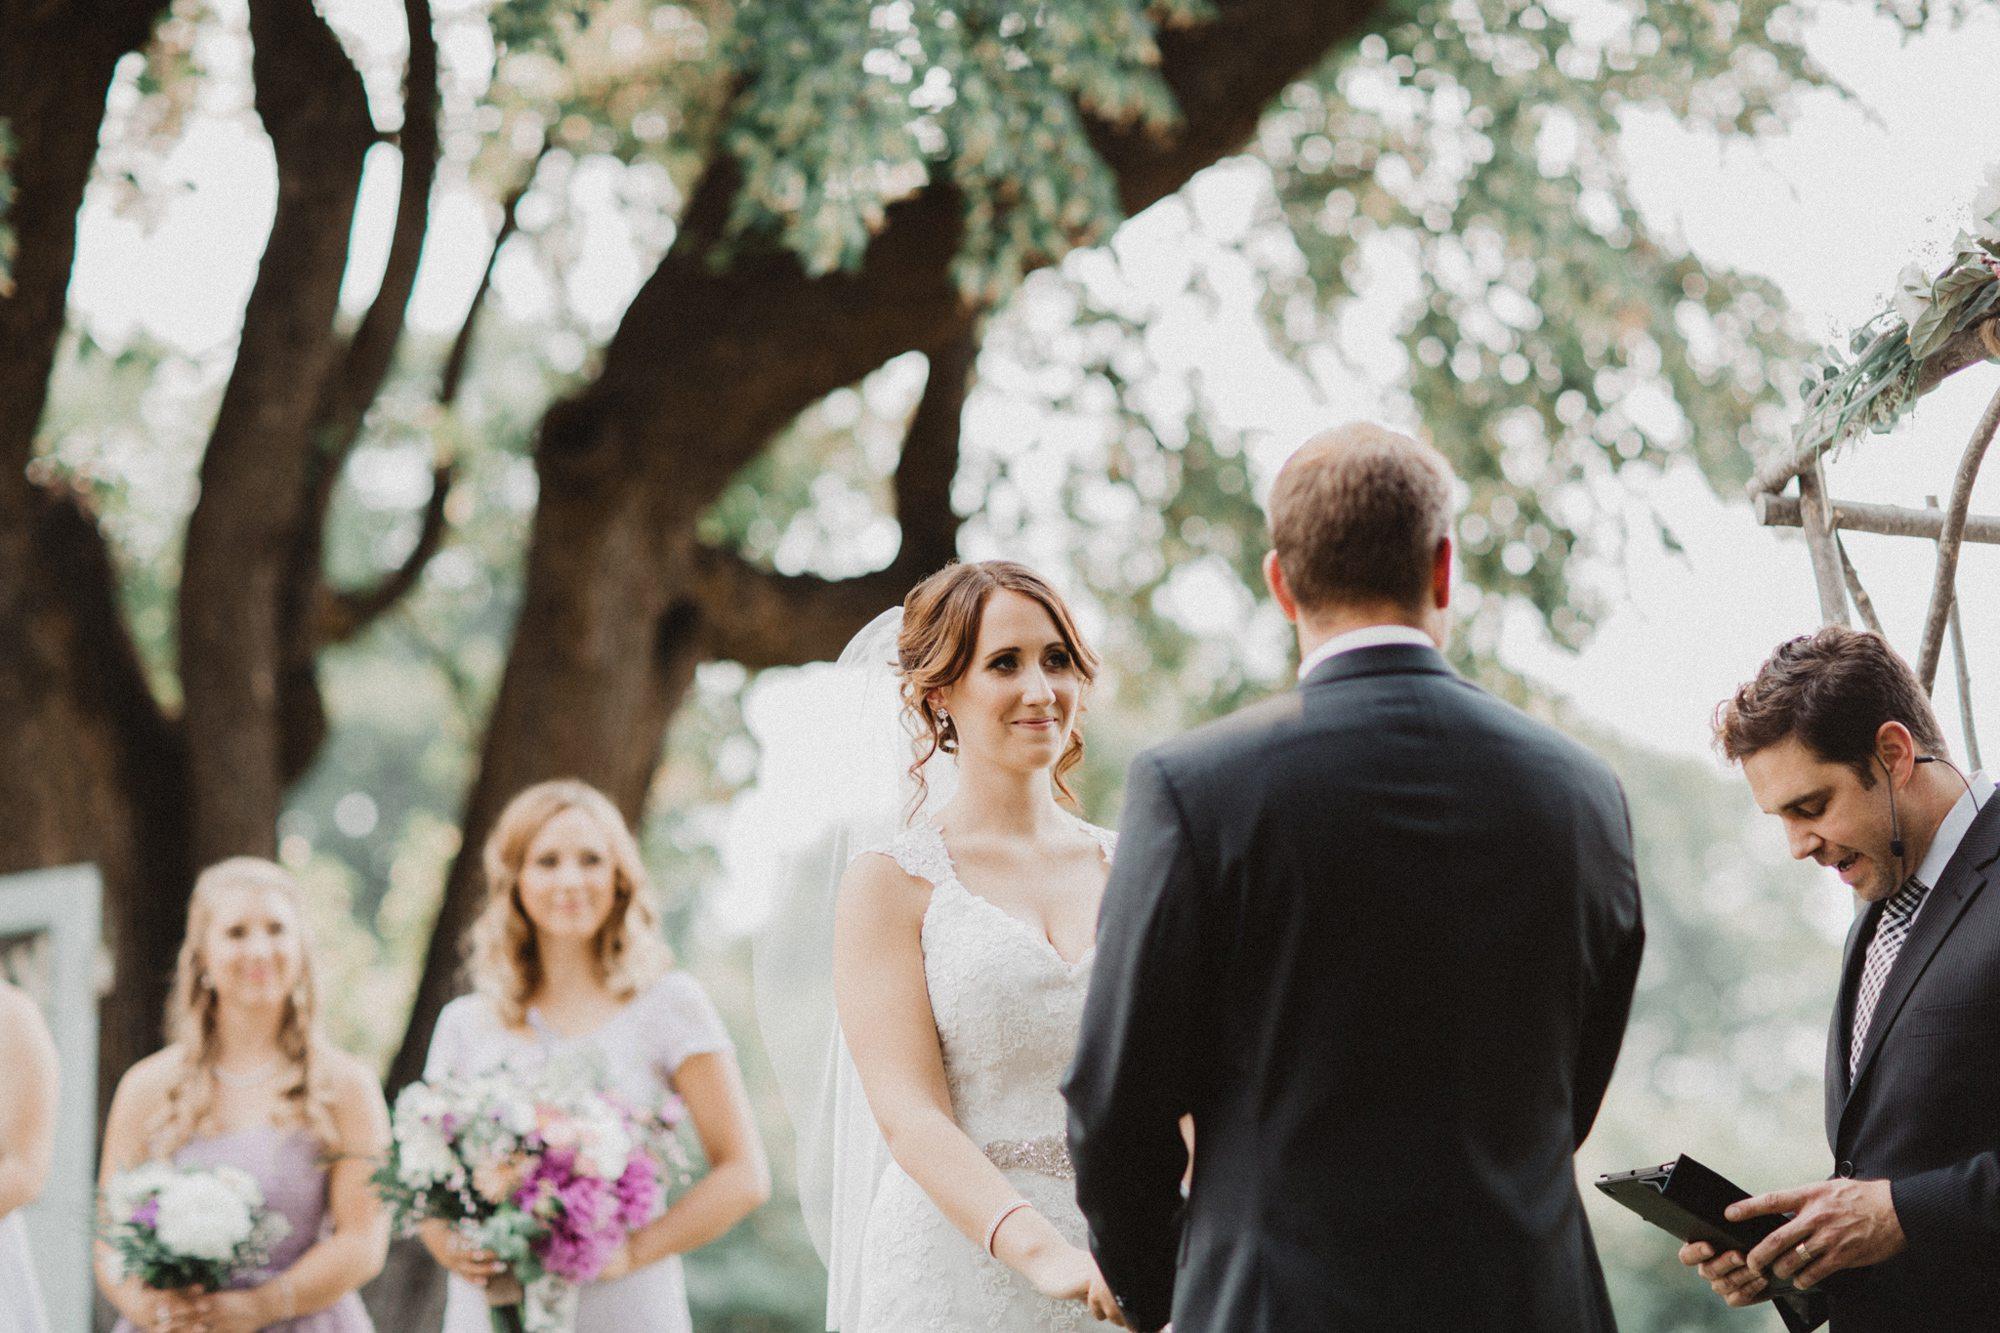 455-vernon-wedding-photographer